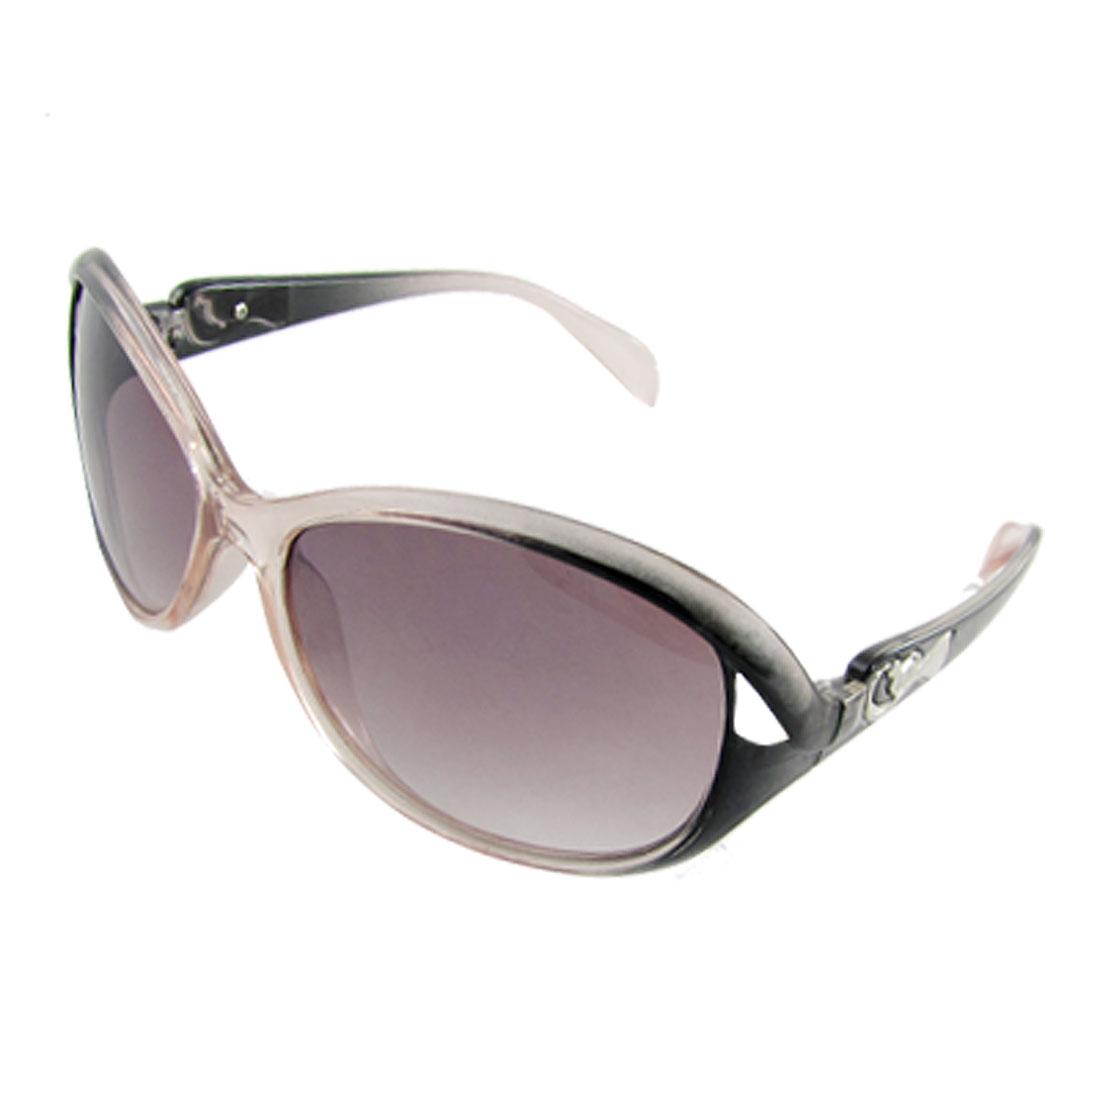 Lady Plastic Frame Metallic Motif Detail Temple Sunglasses